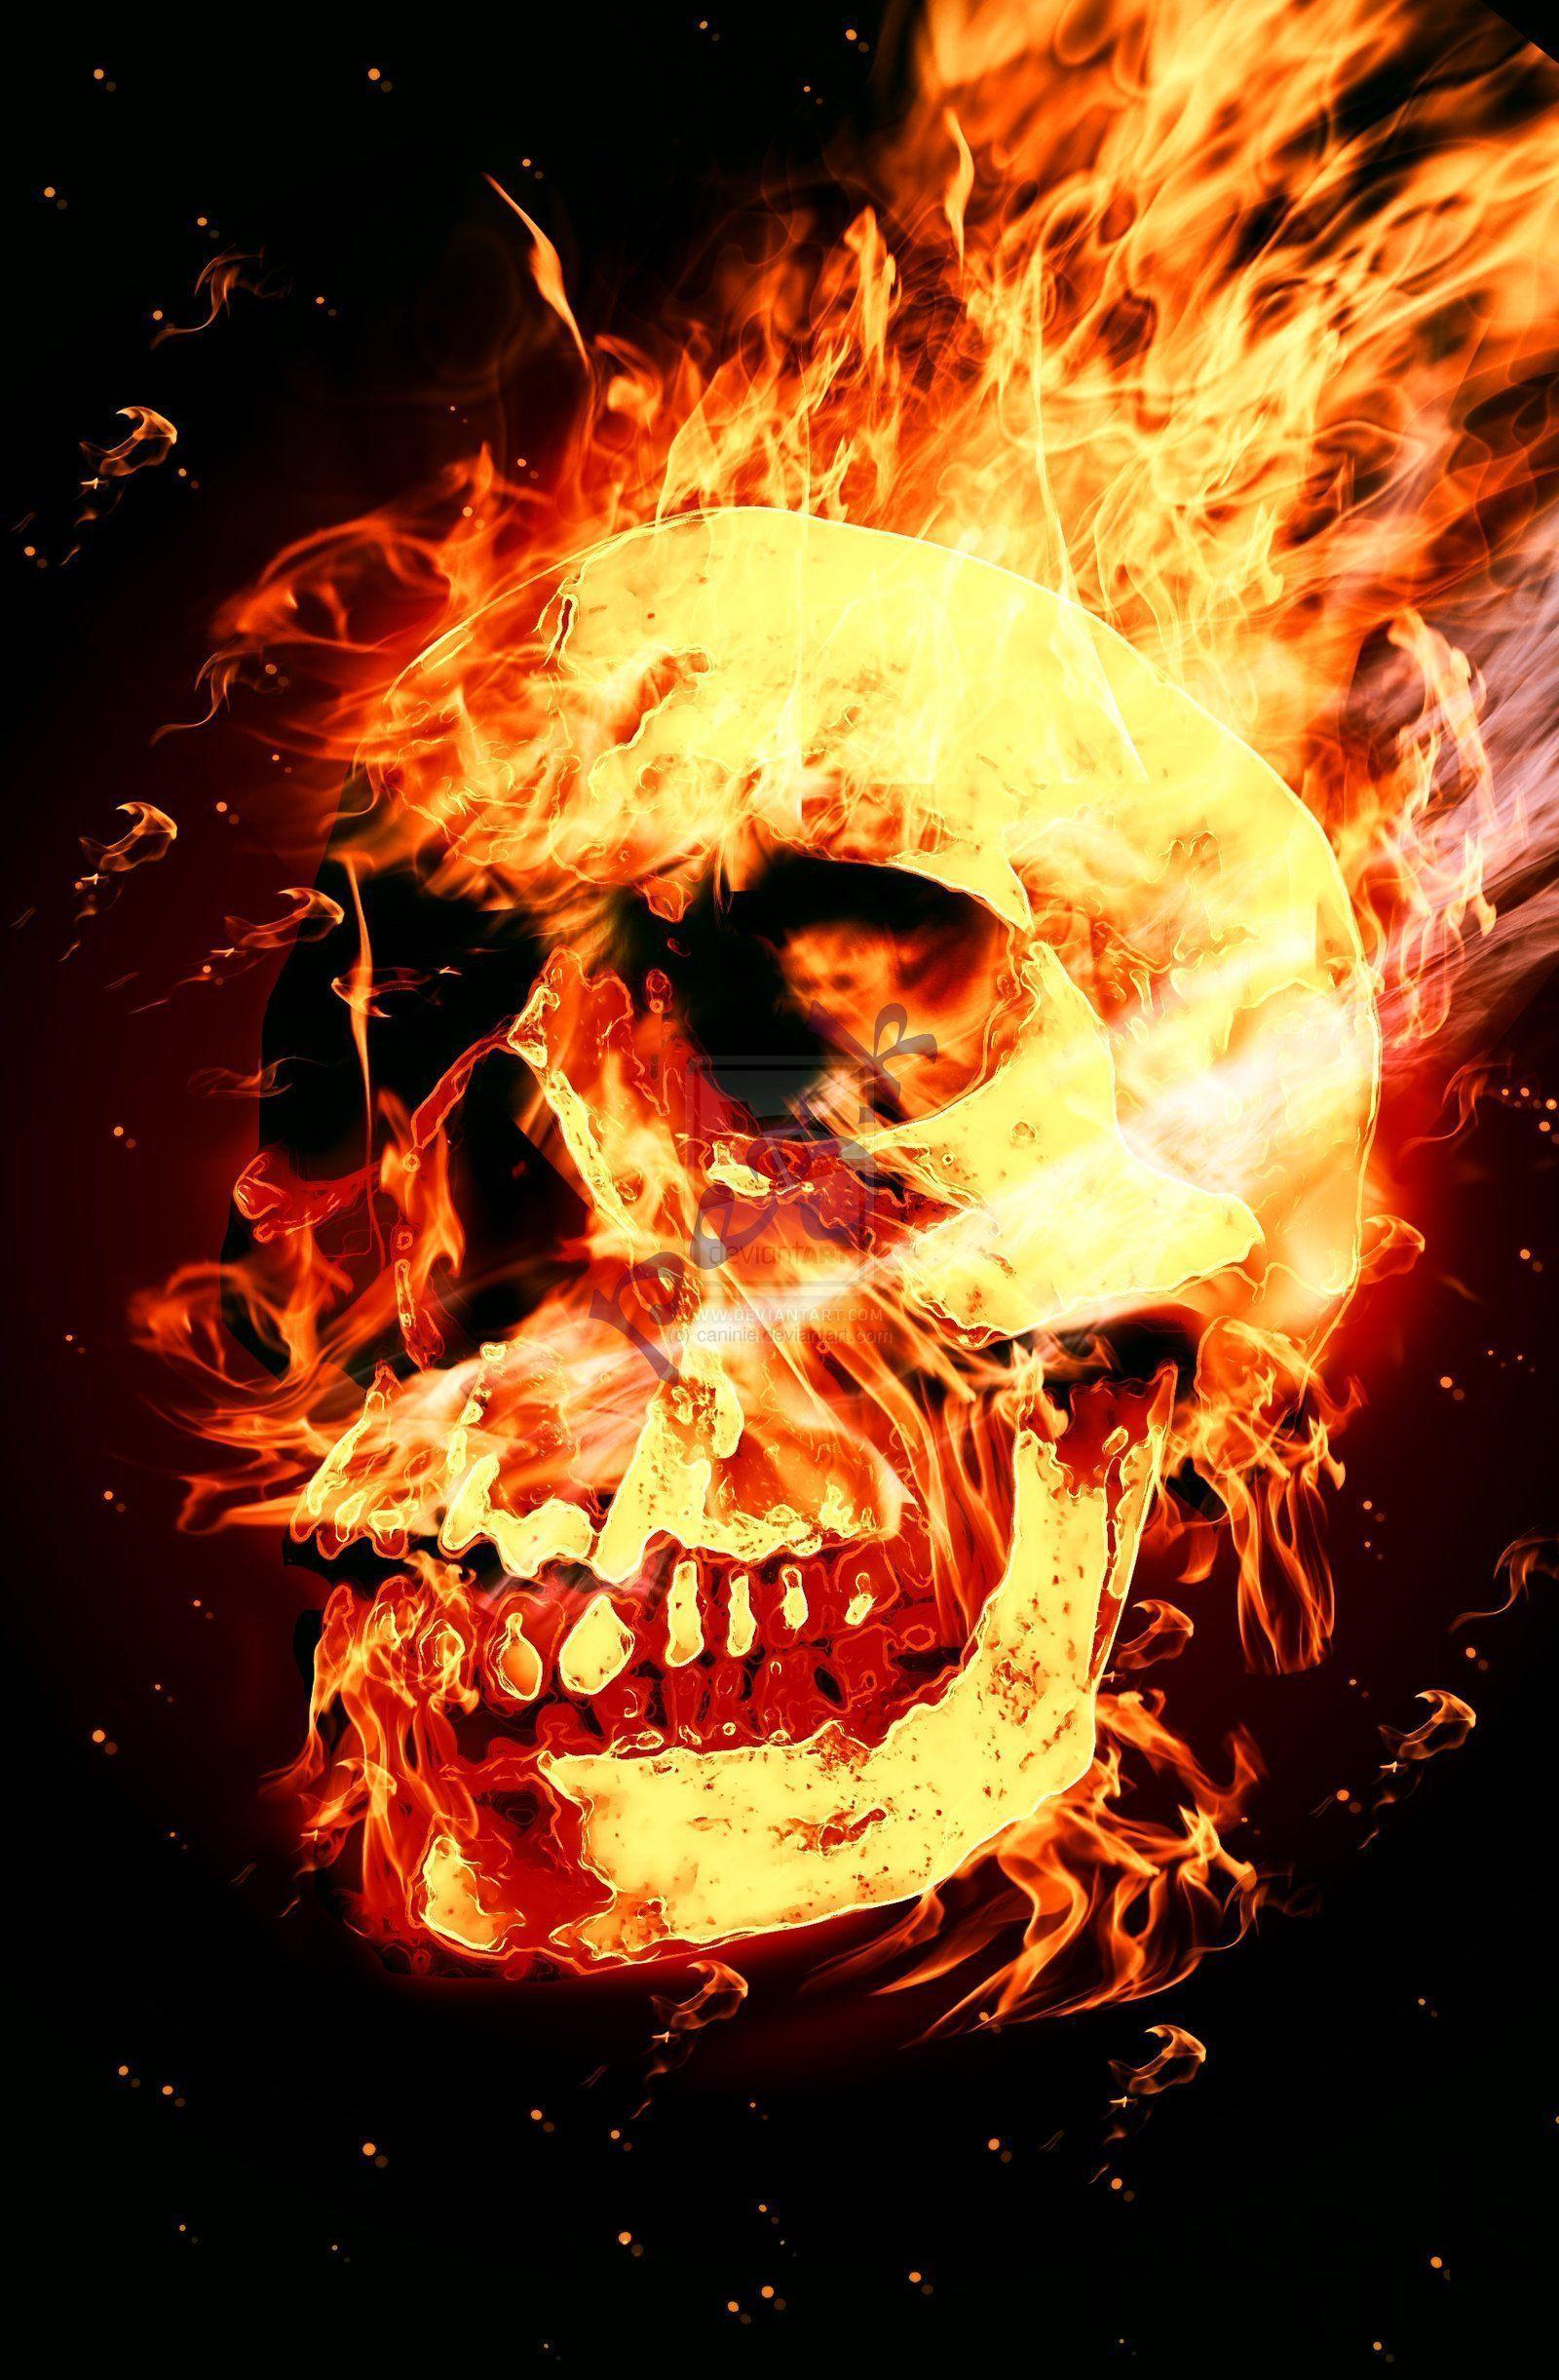 Skulls On Fire Wallpapers 1600x2442